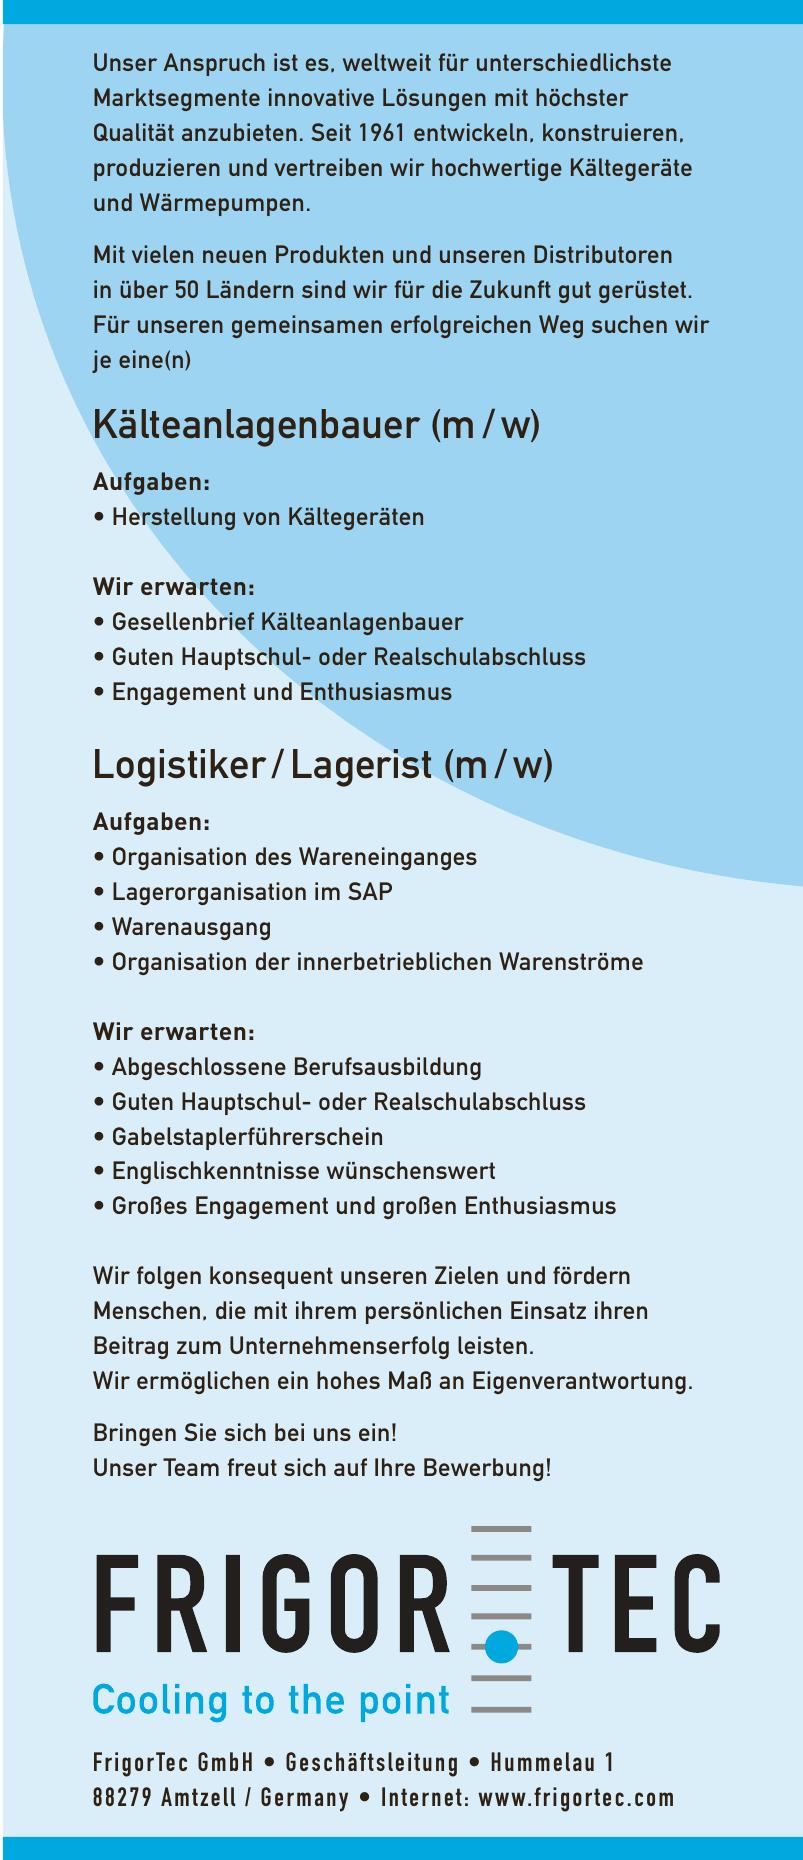 FrigorTec GmbH